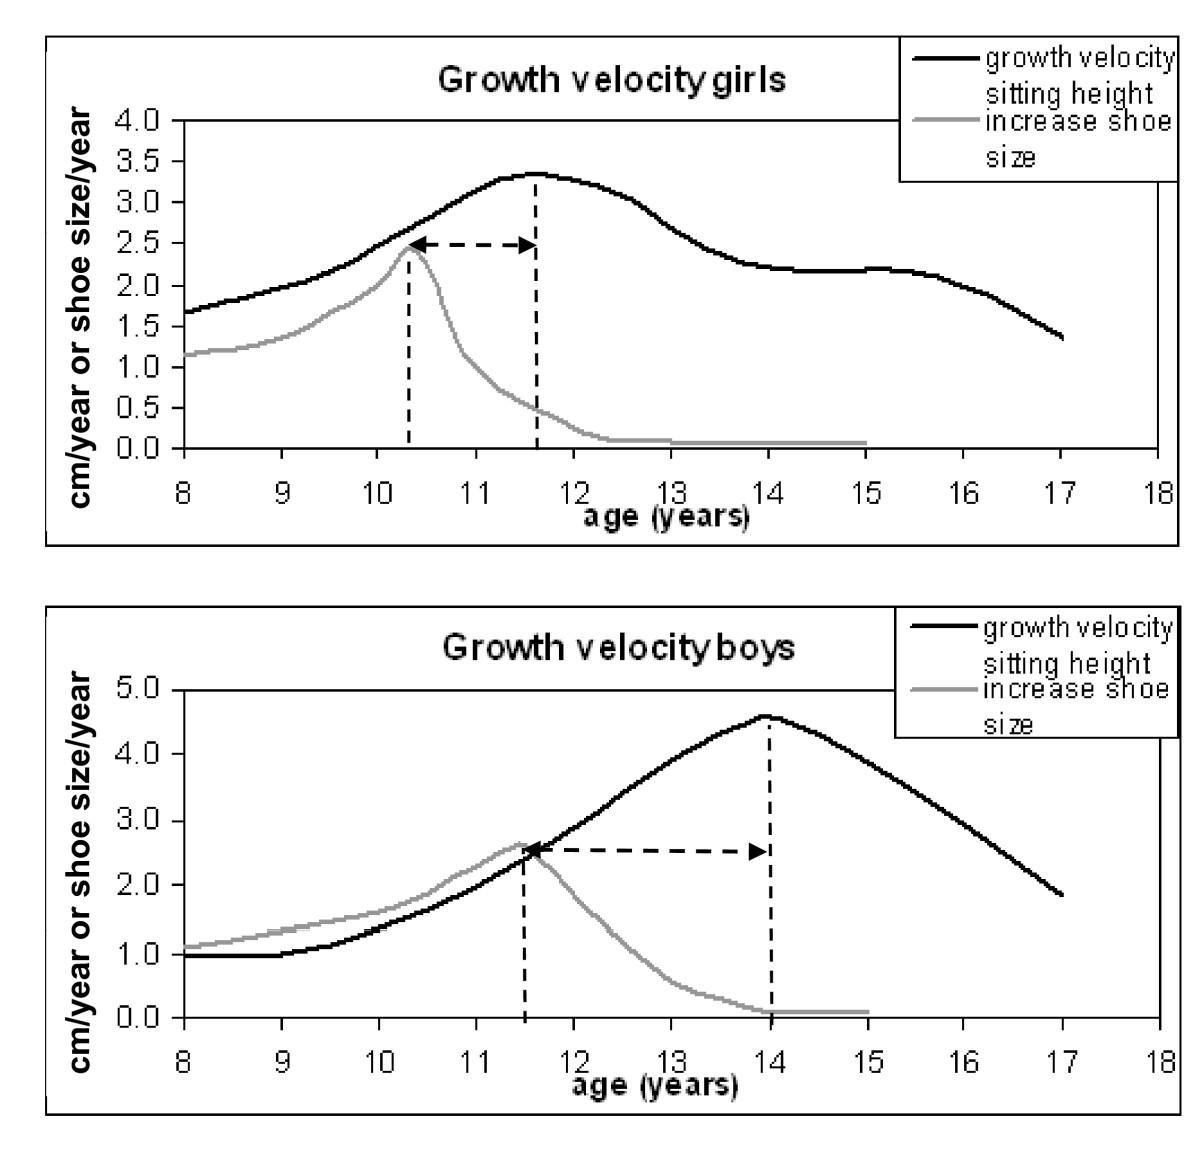 average infant shoe size by age